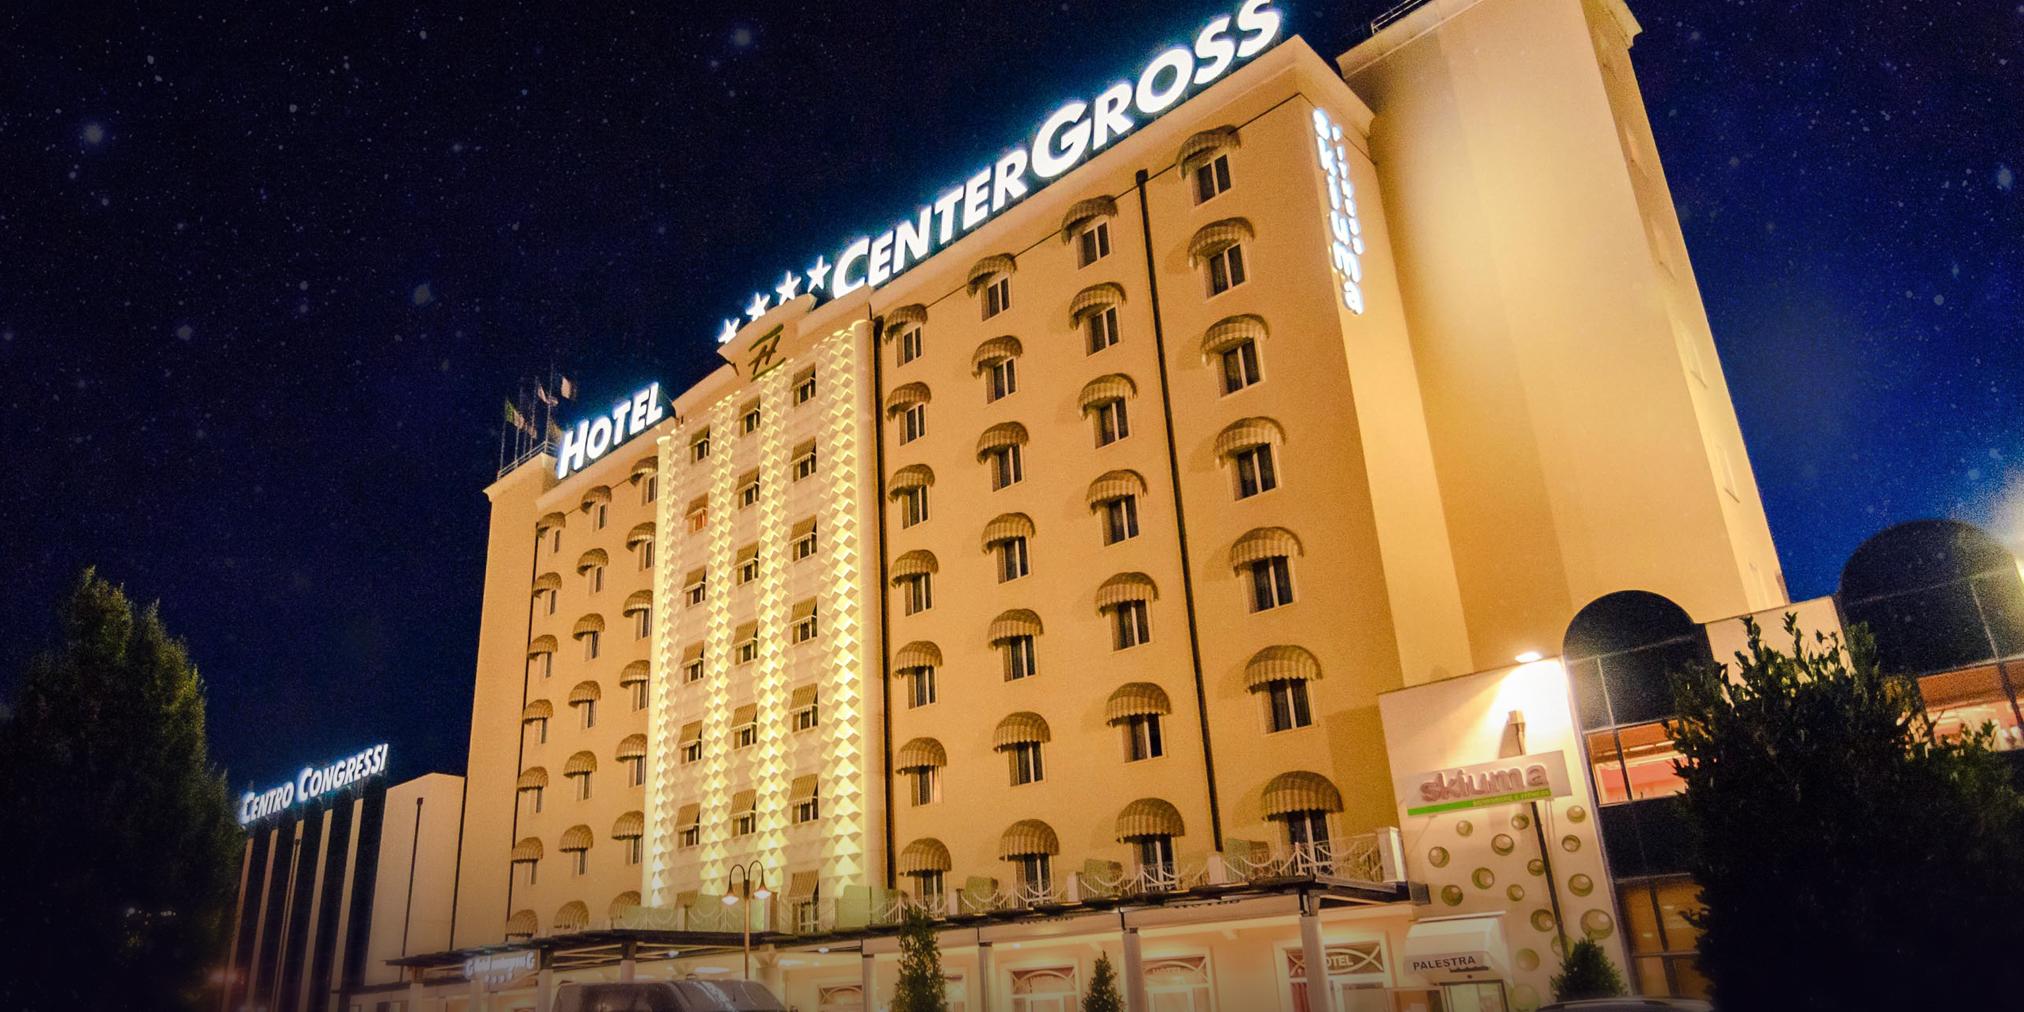 hotel-centro-congressi-a-bologna-2048